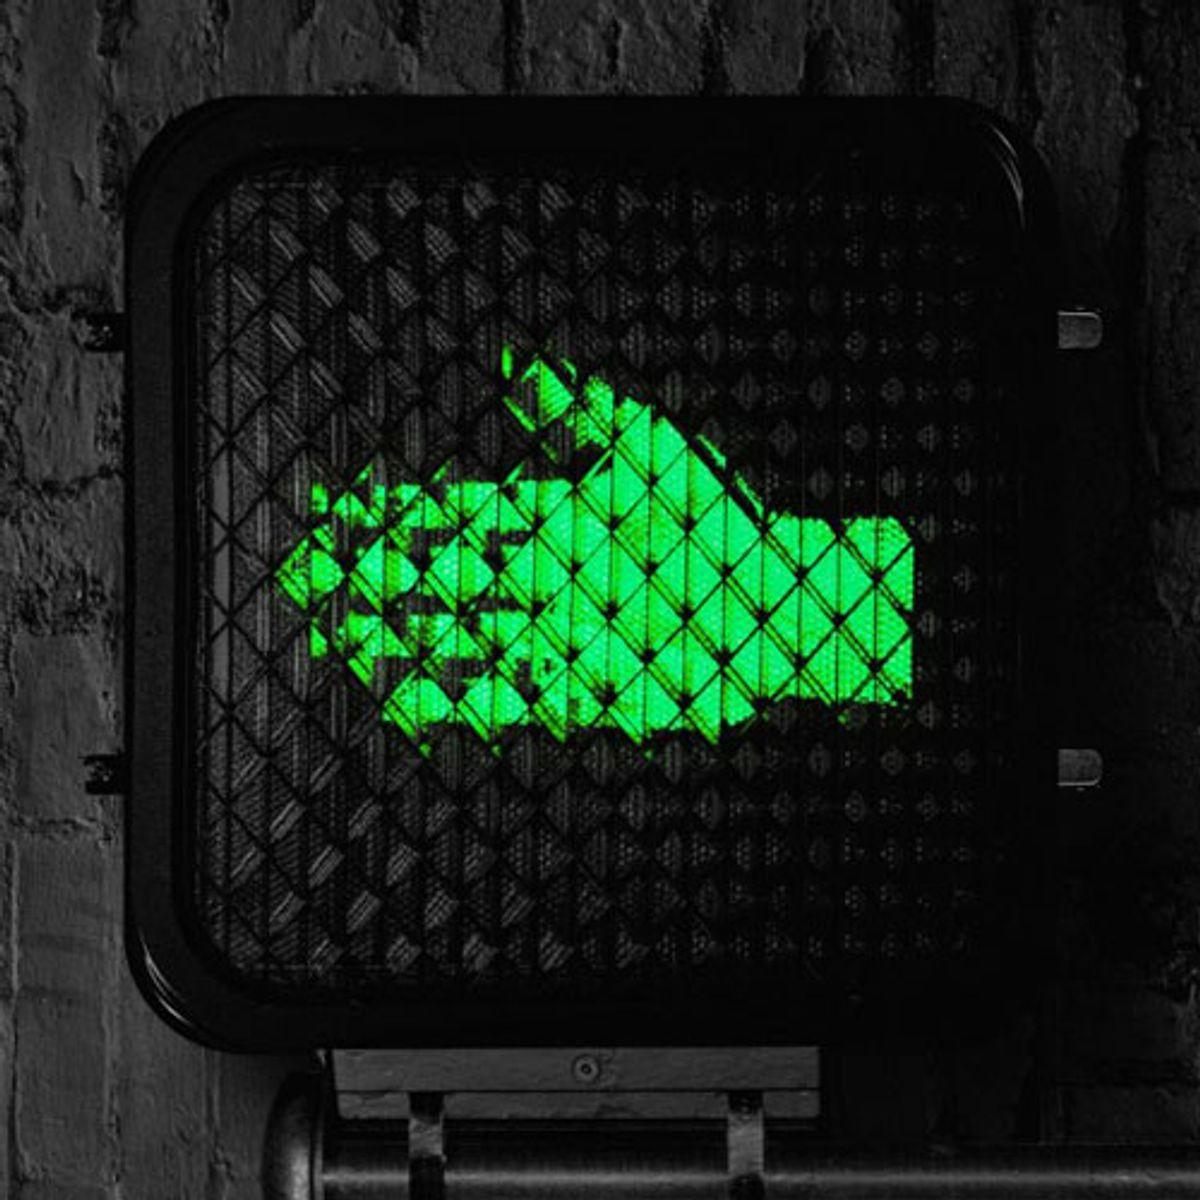 The Raconteurs Announce New Album, 'Help Us Stranger'